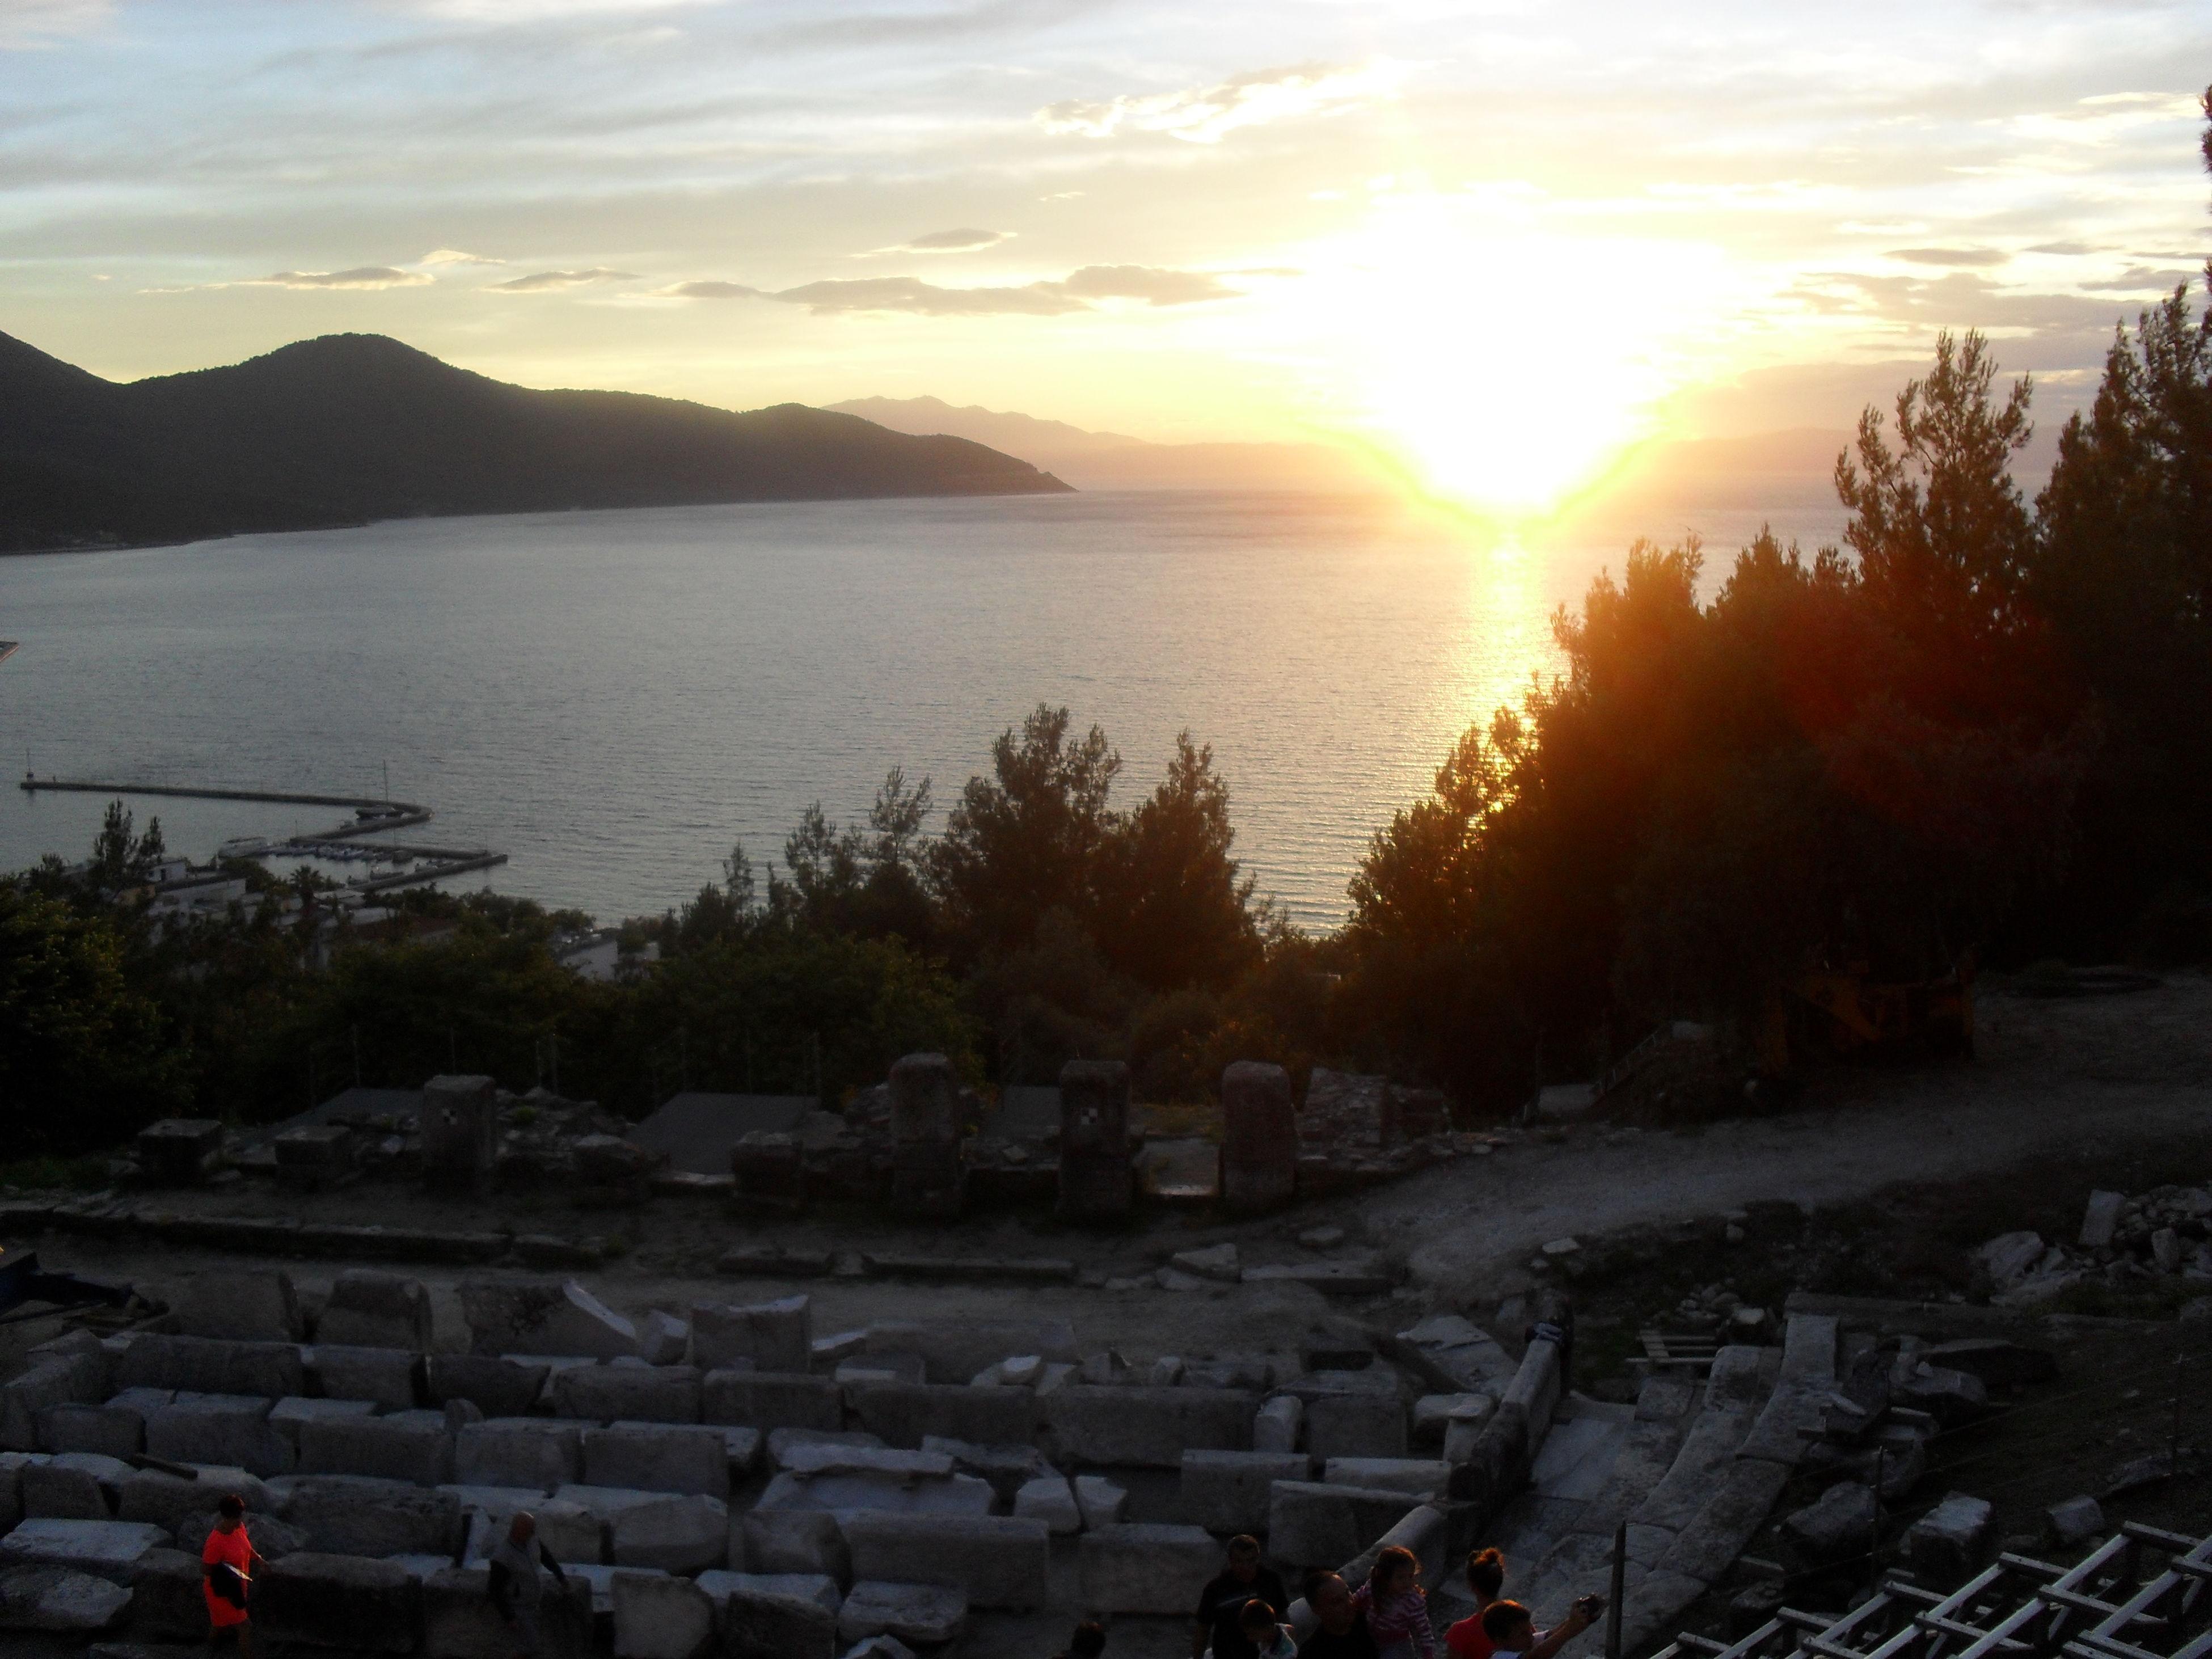 sunset, water, sky, nature, beauty in nature, sea, sunlight, tree, sun, sunbeam, scenics, outdoors, mountain, no people, day